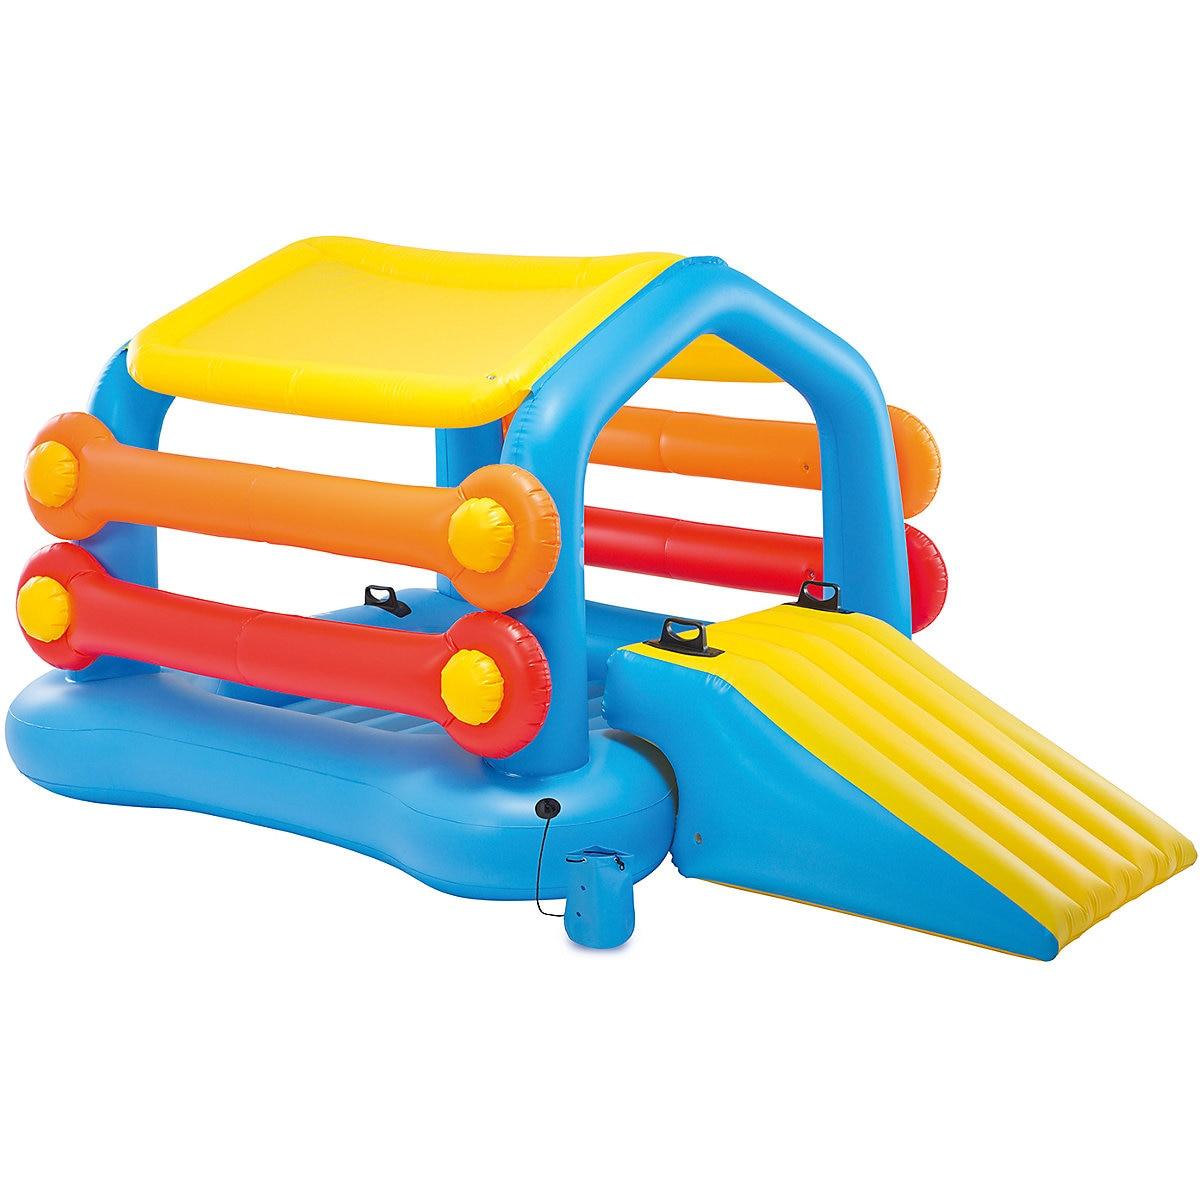 купить INTEX Inflatable Toys 4968663 games toy trampoline for children Kids game MTpromo дешево